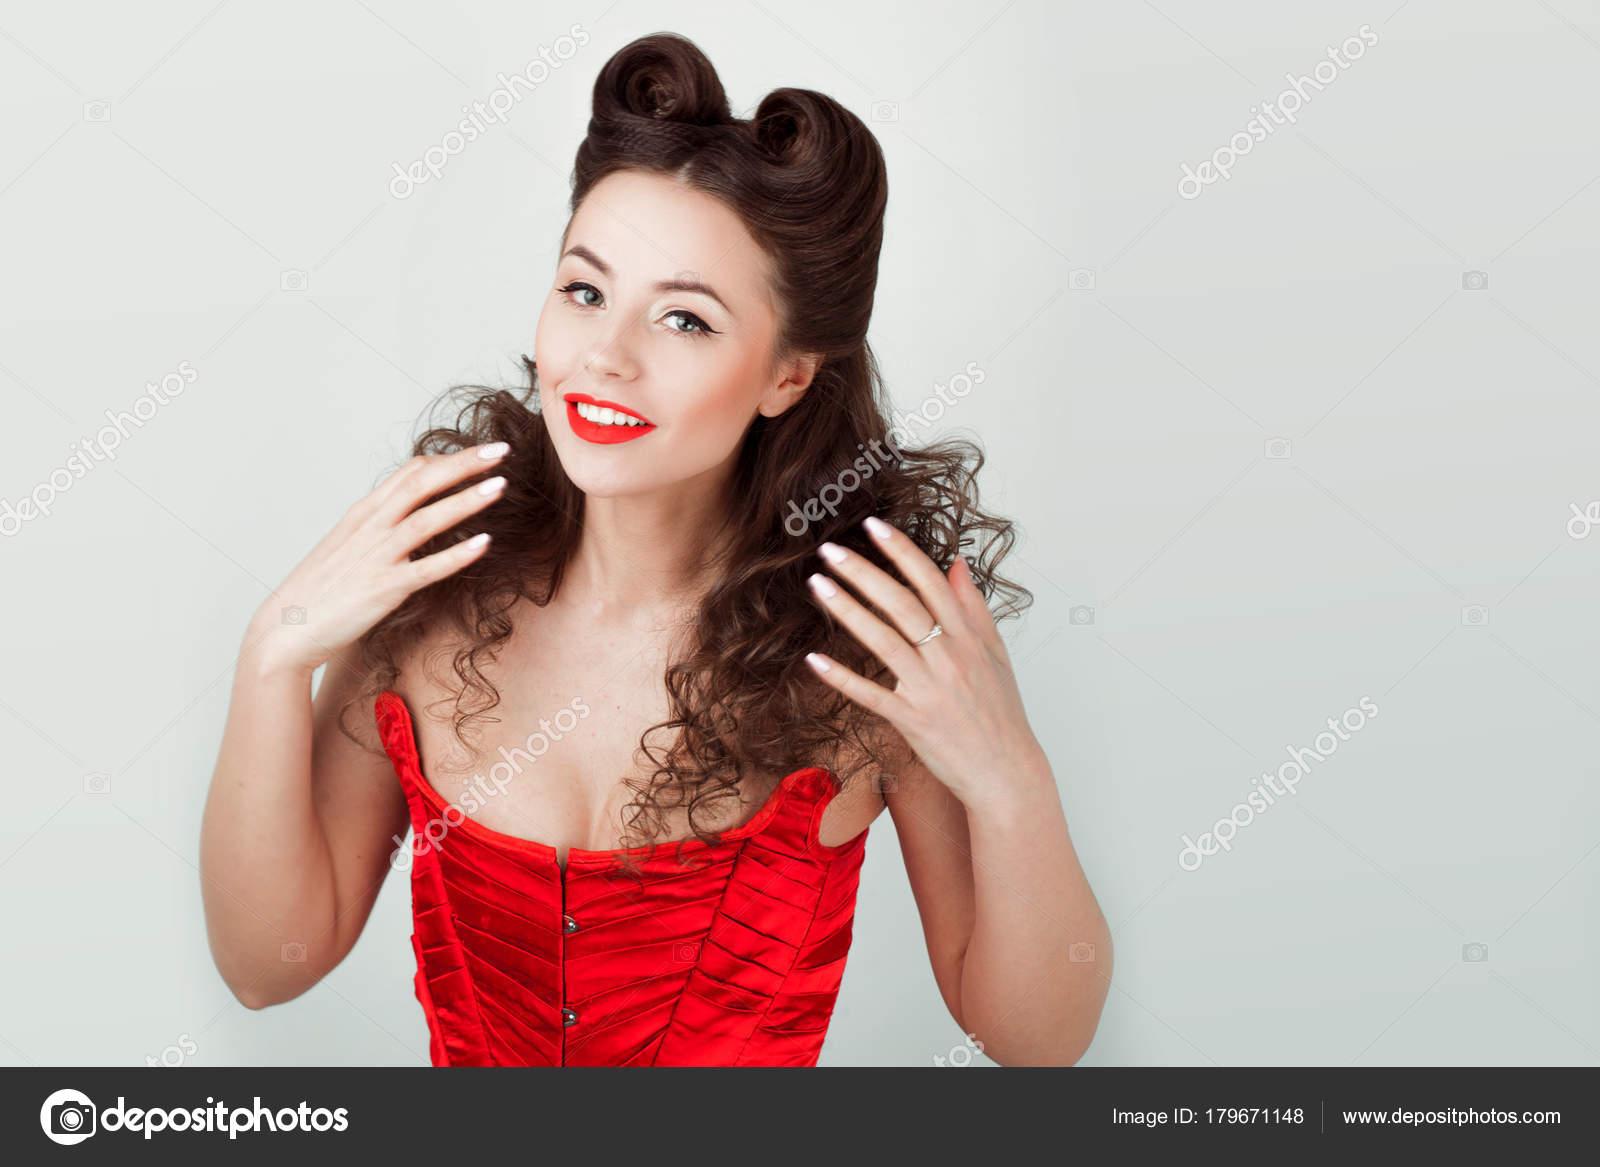 Charmante Dame Im Roten Korsett Pin Up Frisur Stockfoto